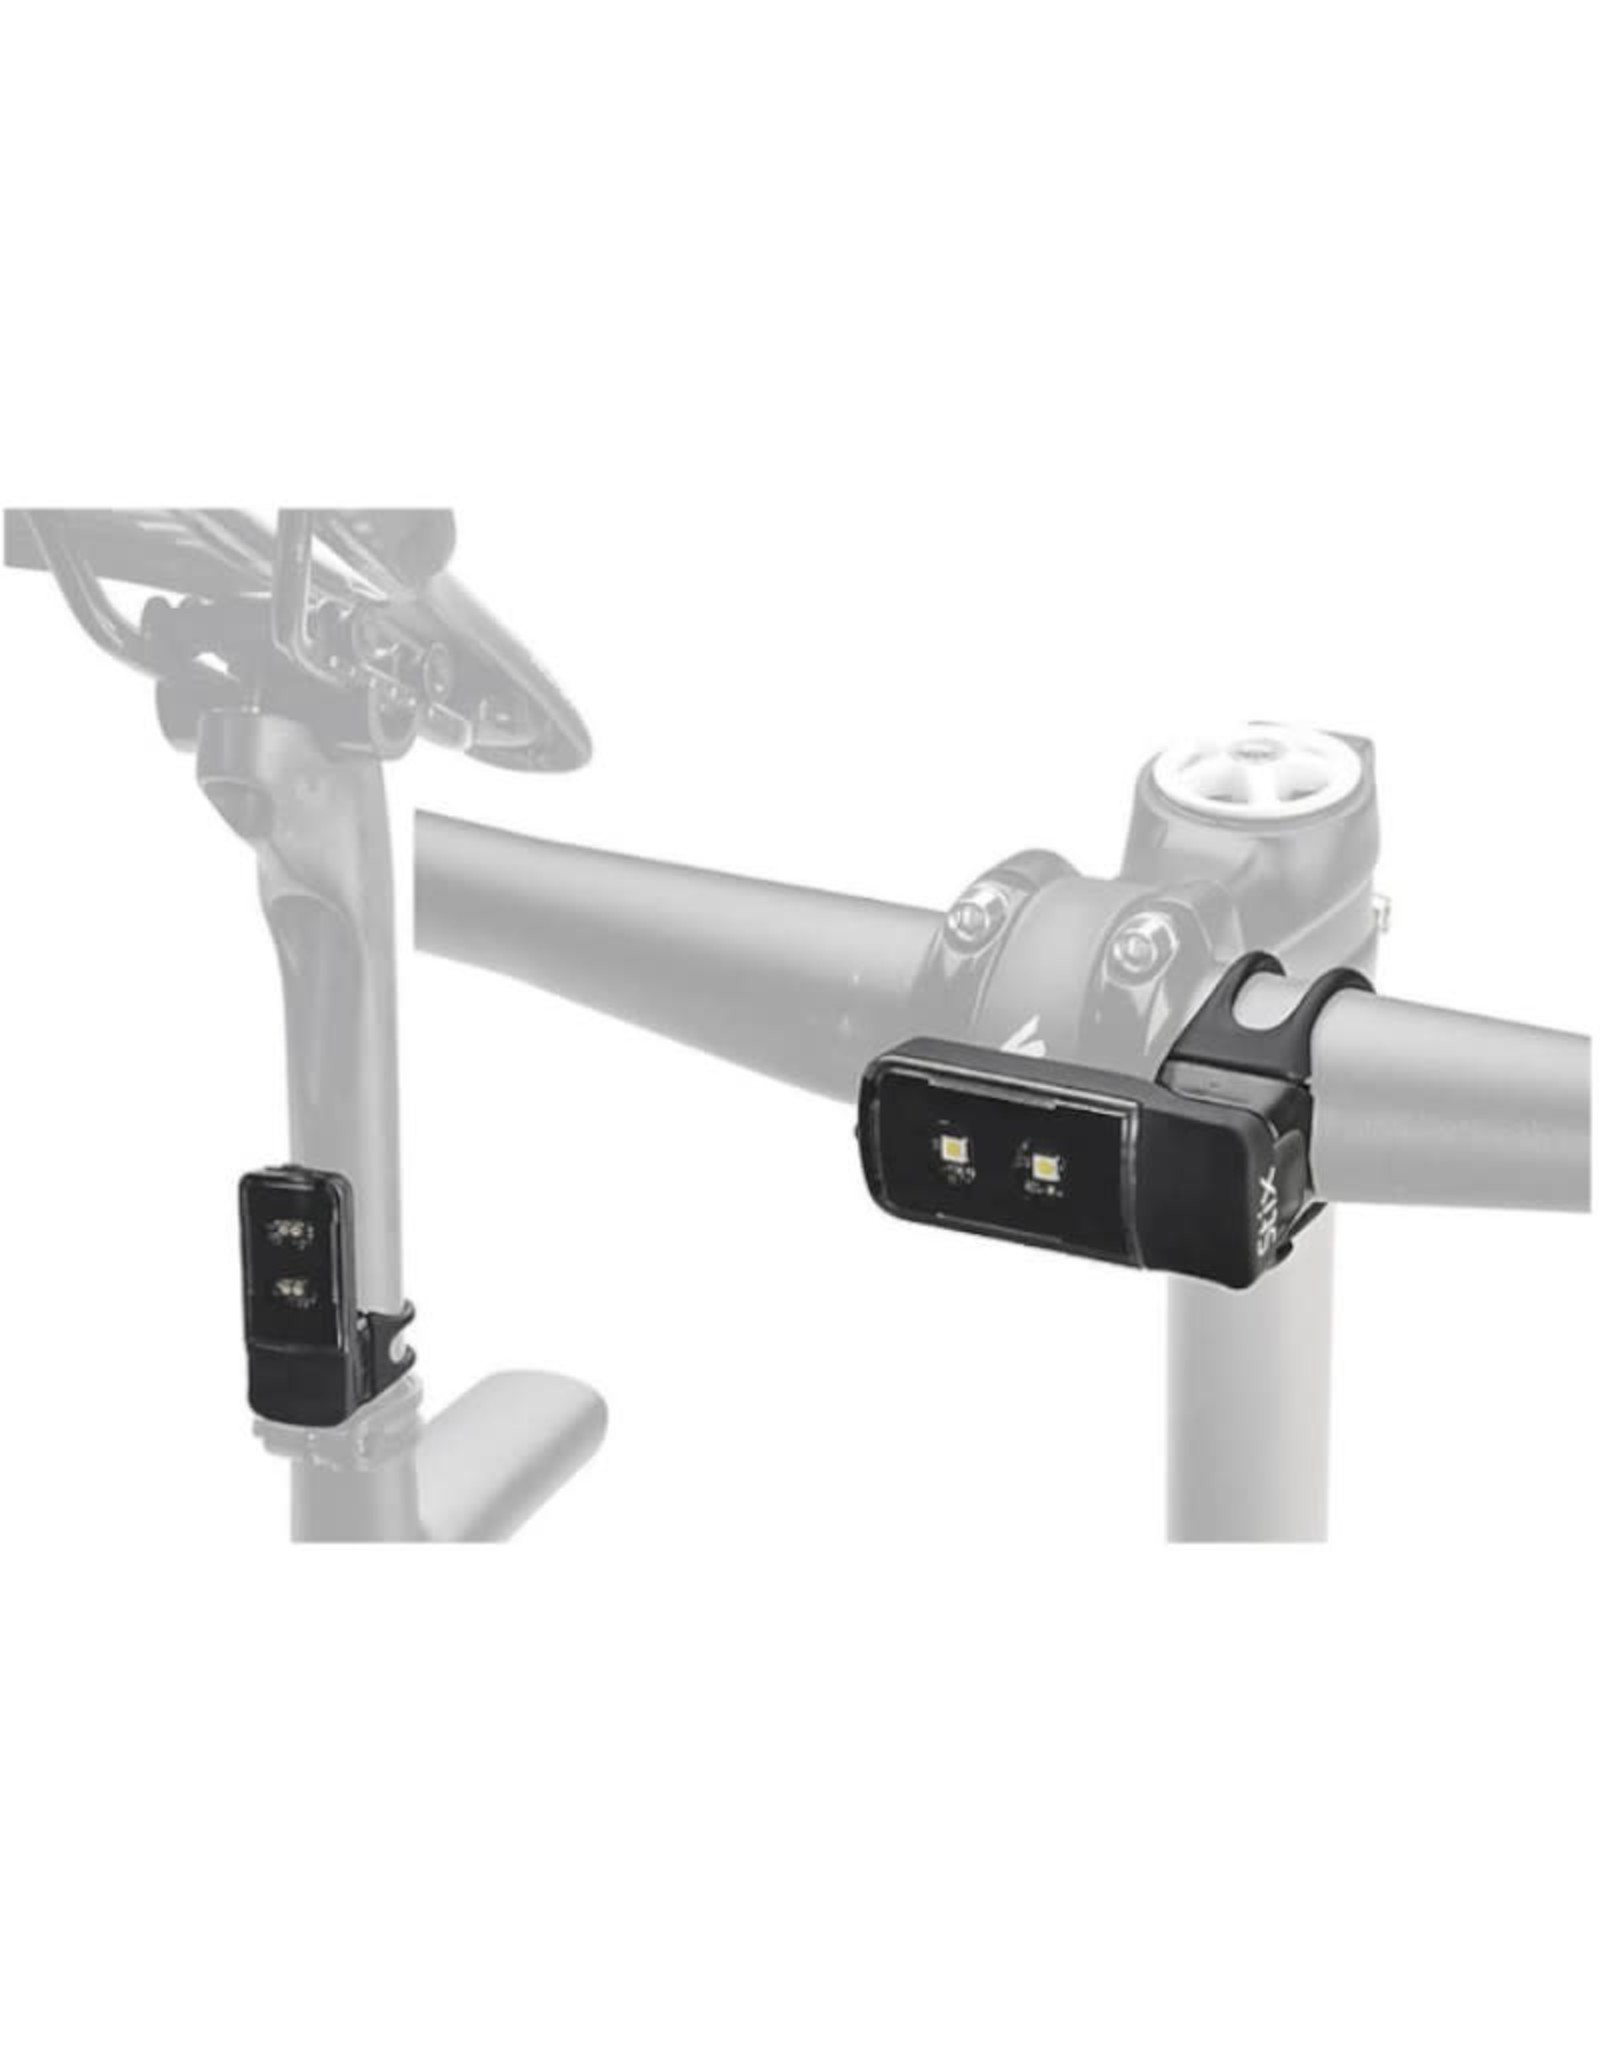 Specialized Specialized - STIX SPORT COMBO HEADLIGHT/TAIL LIGHT